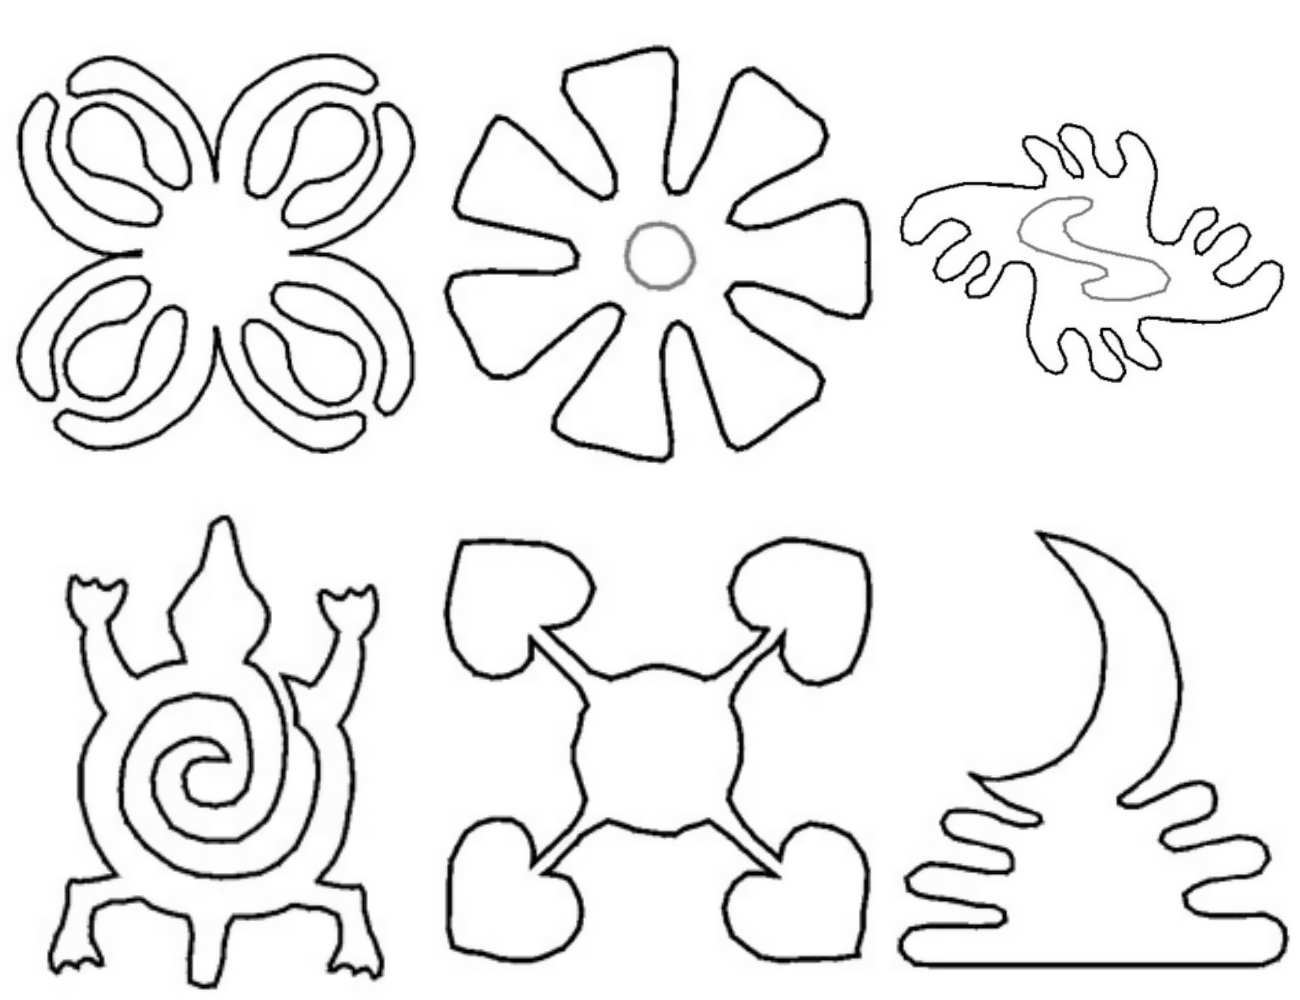 1300x1000 Drawings Of Symbols Electronic Symbols Chart